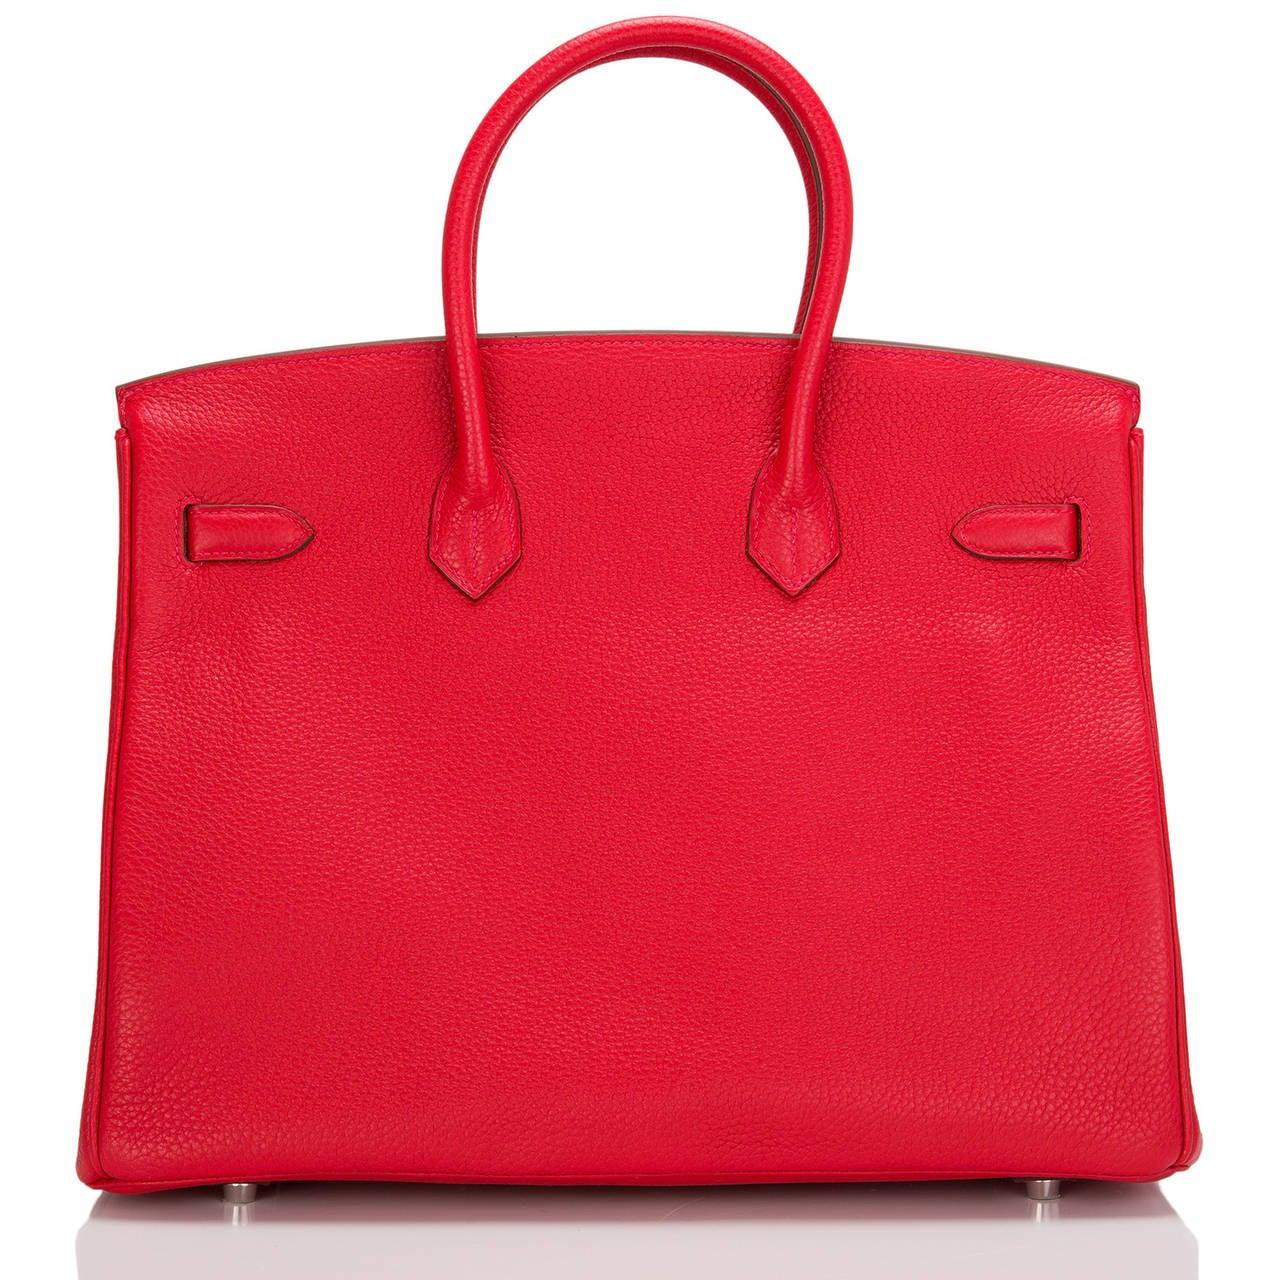 Red Hermes Rouge Casaque Clemence Birkin 35cm Palladium Hardware For Sale